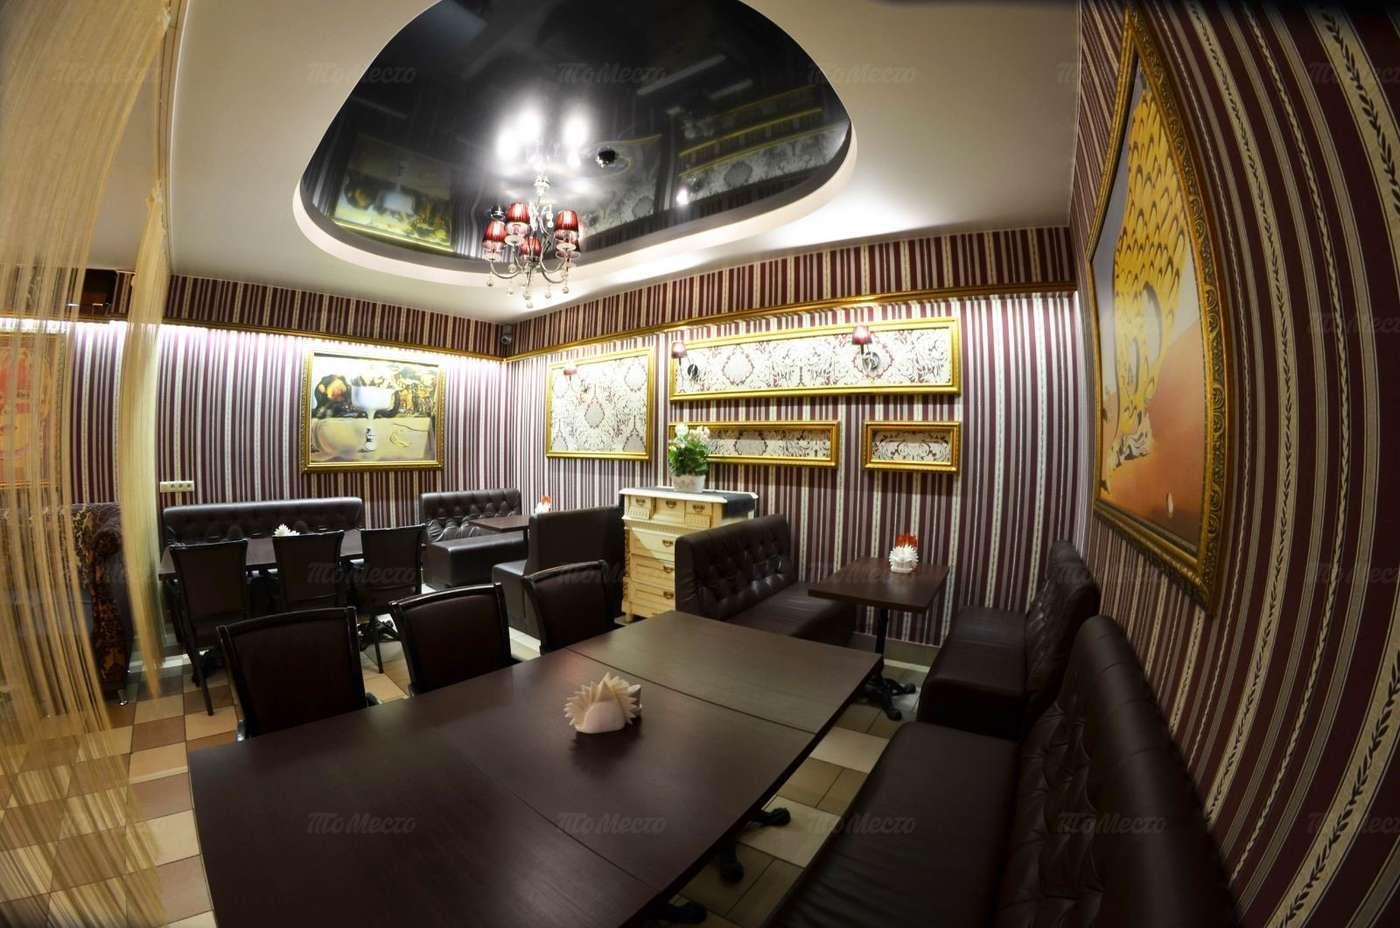 Кафе Дали (Dali) на Мещерском бульваре